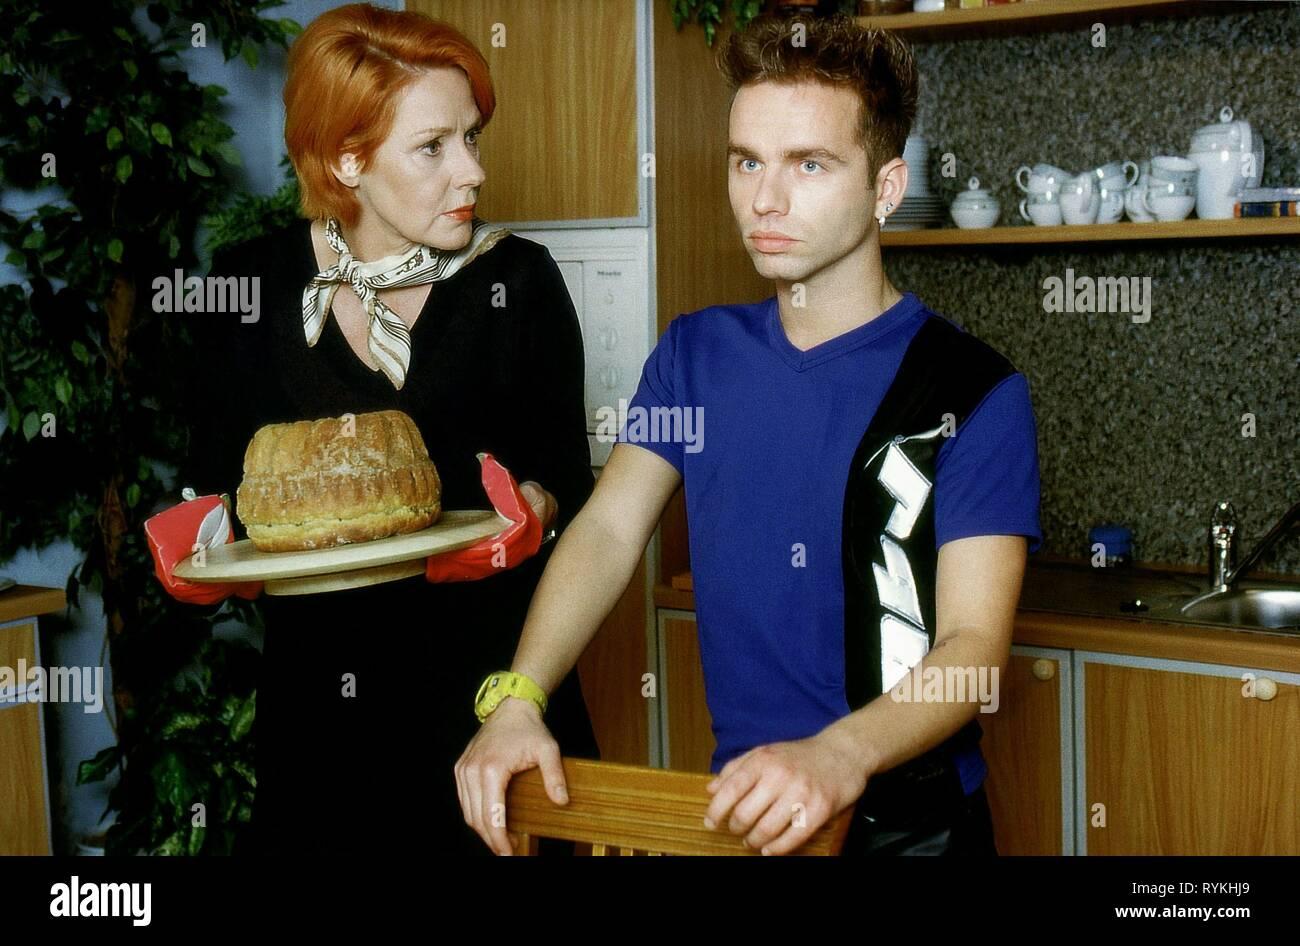 BRAMS,THIEMANN, MARIENHOF, 1998 - Stock Image